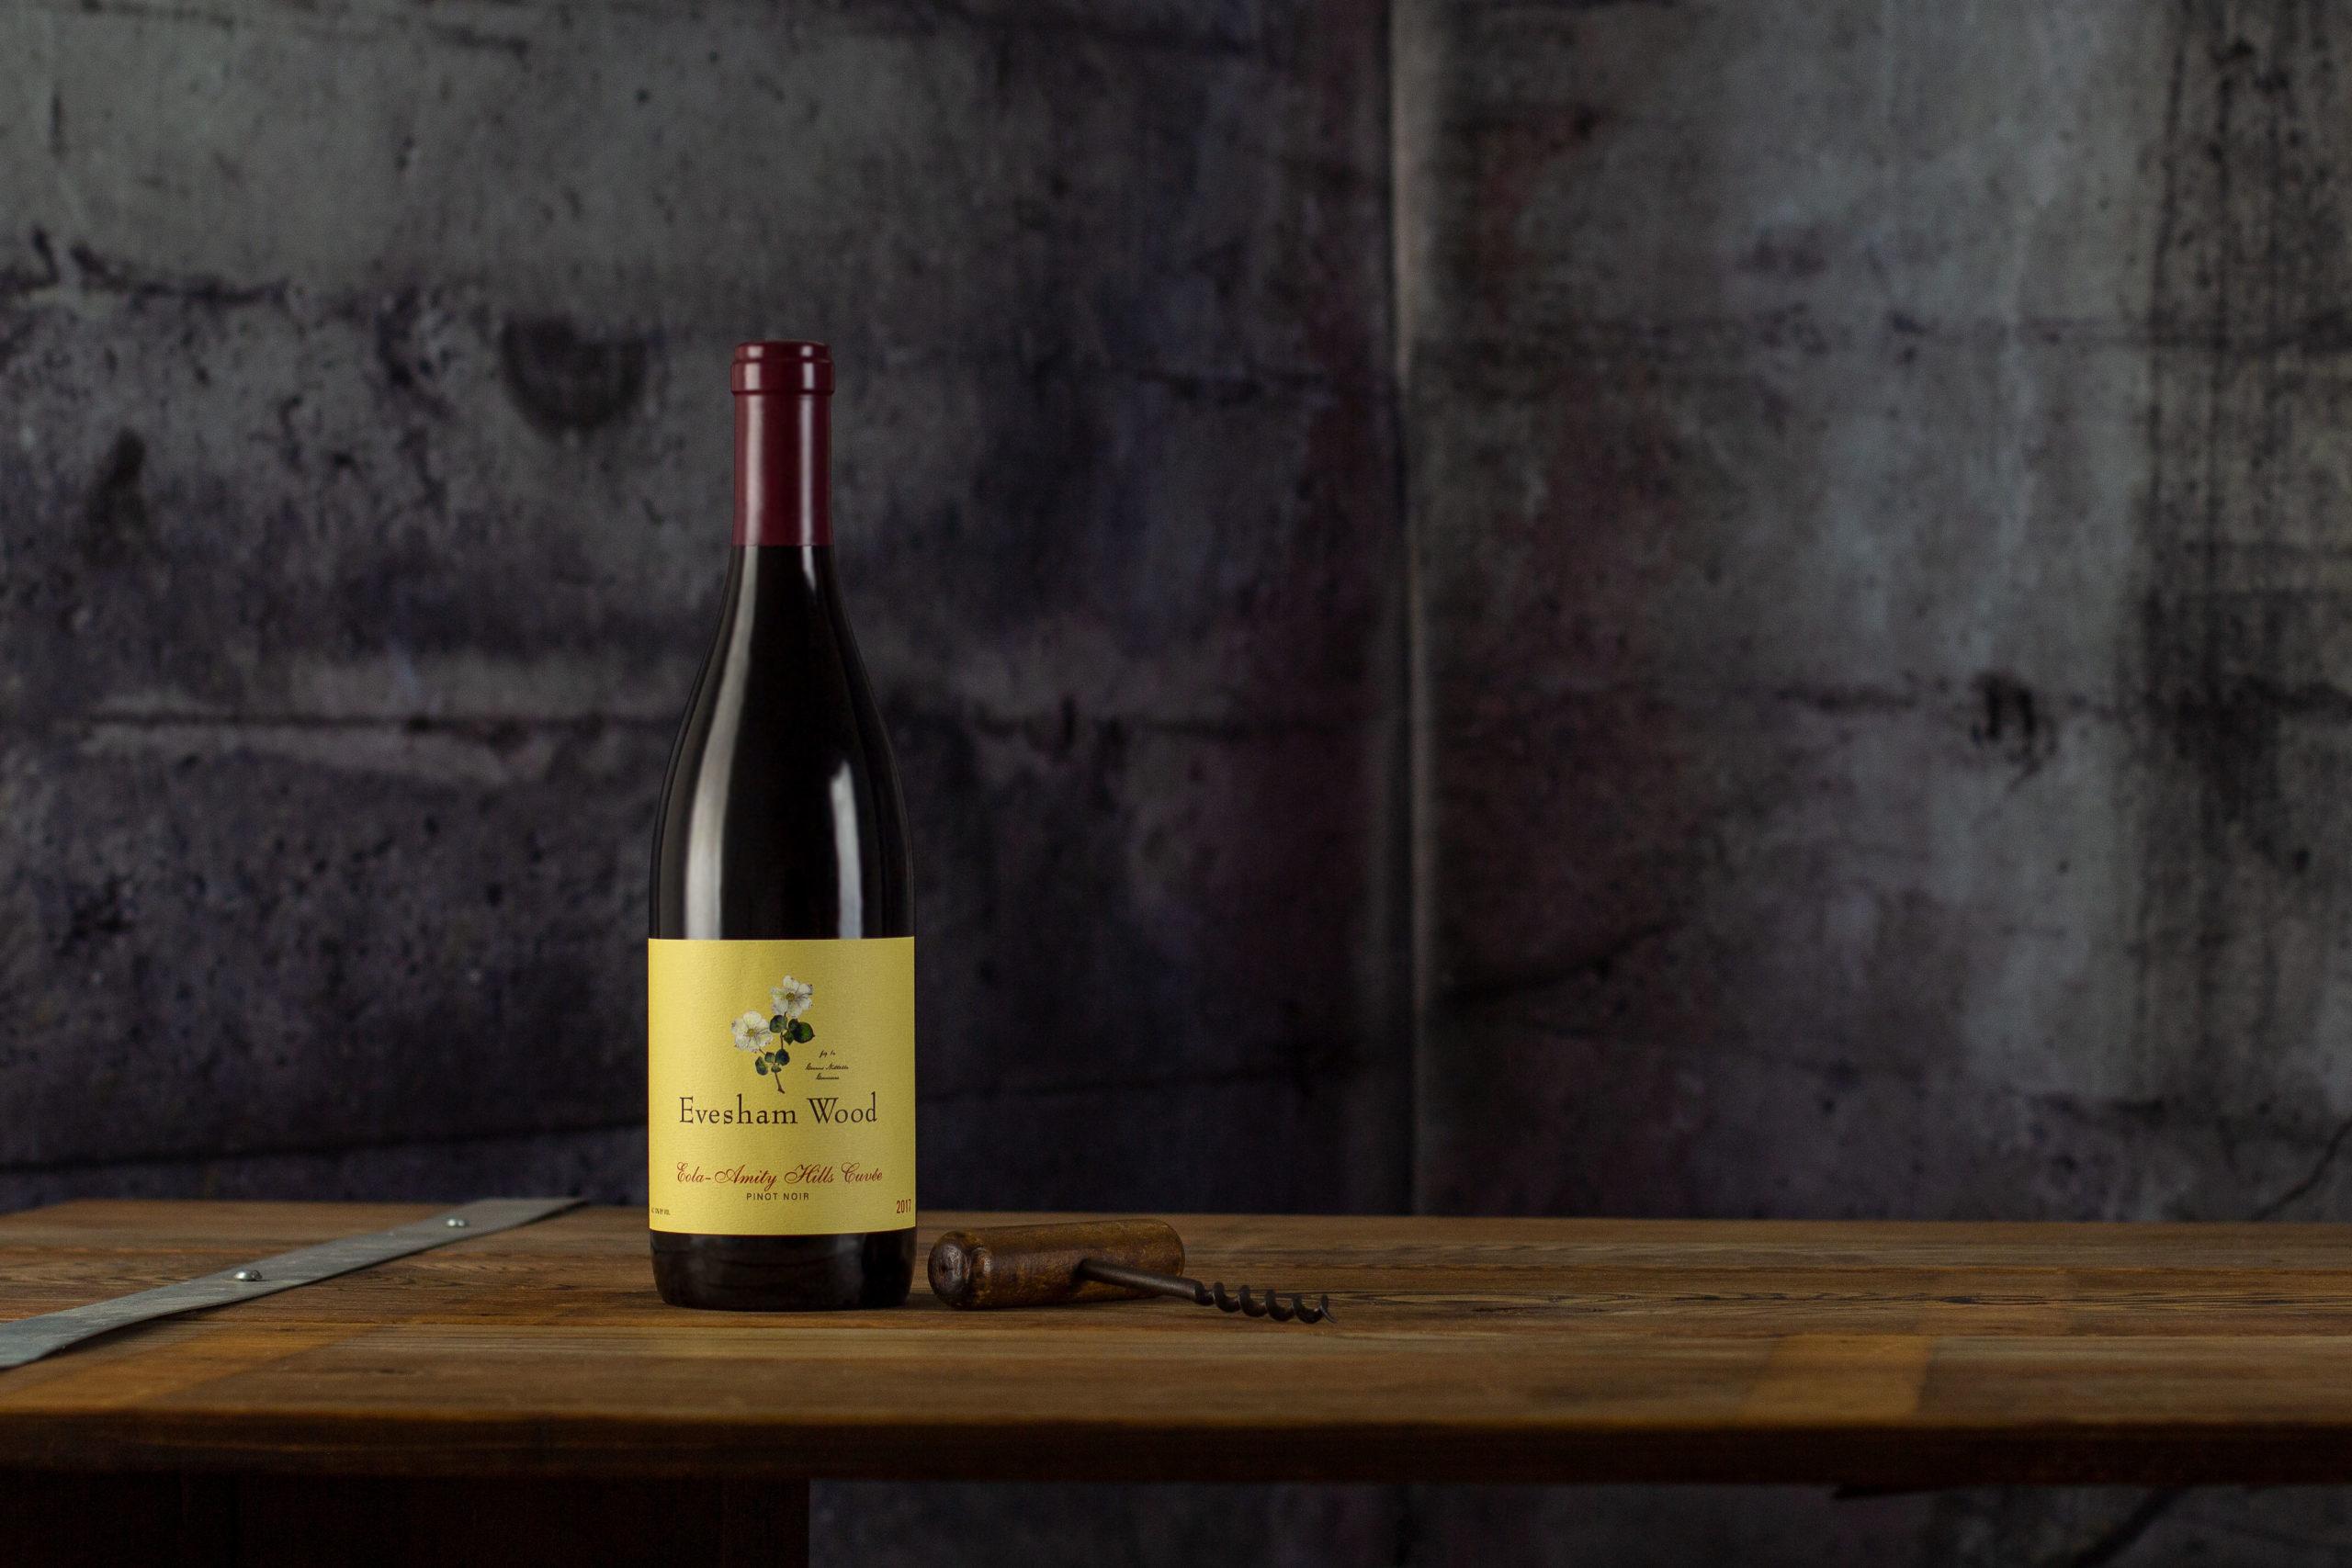 Evesham Wood, Eola-Amity Hills Pinot Noir